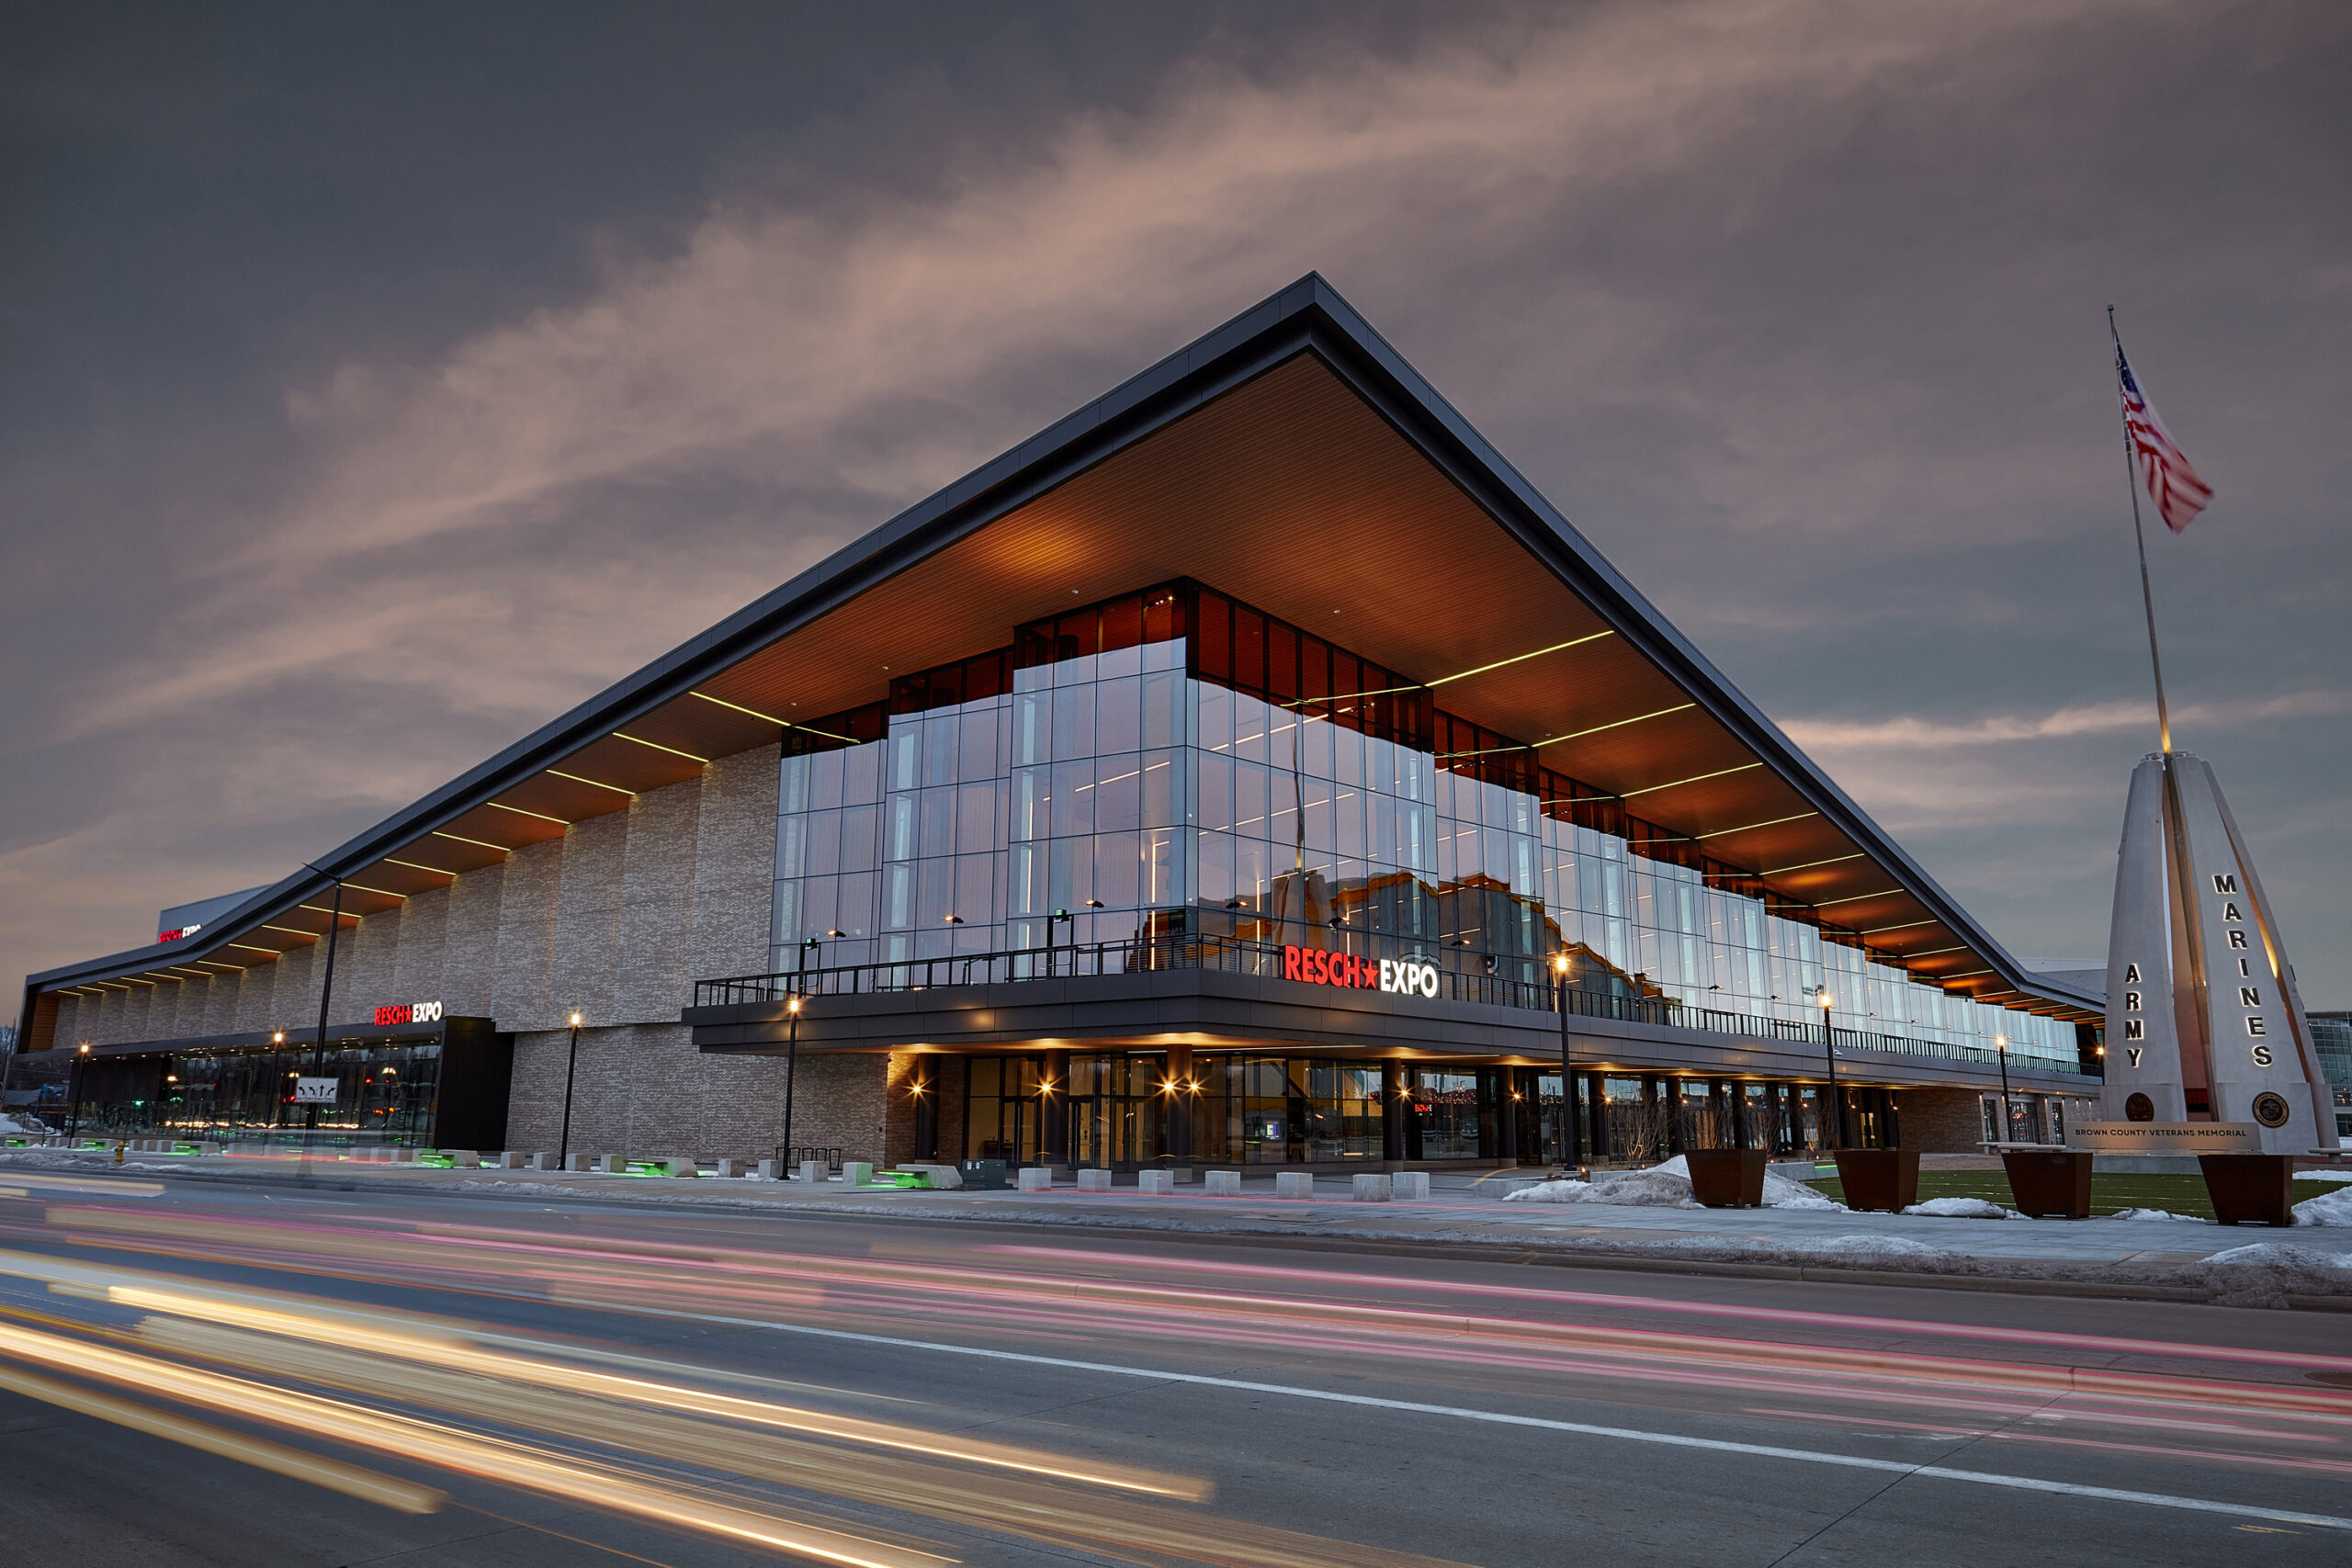 Resch Expo Green Bay Wisconsin